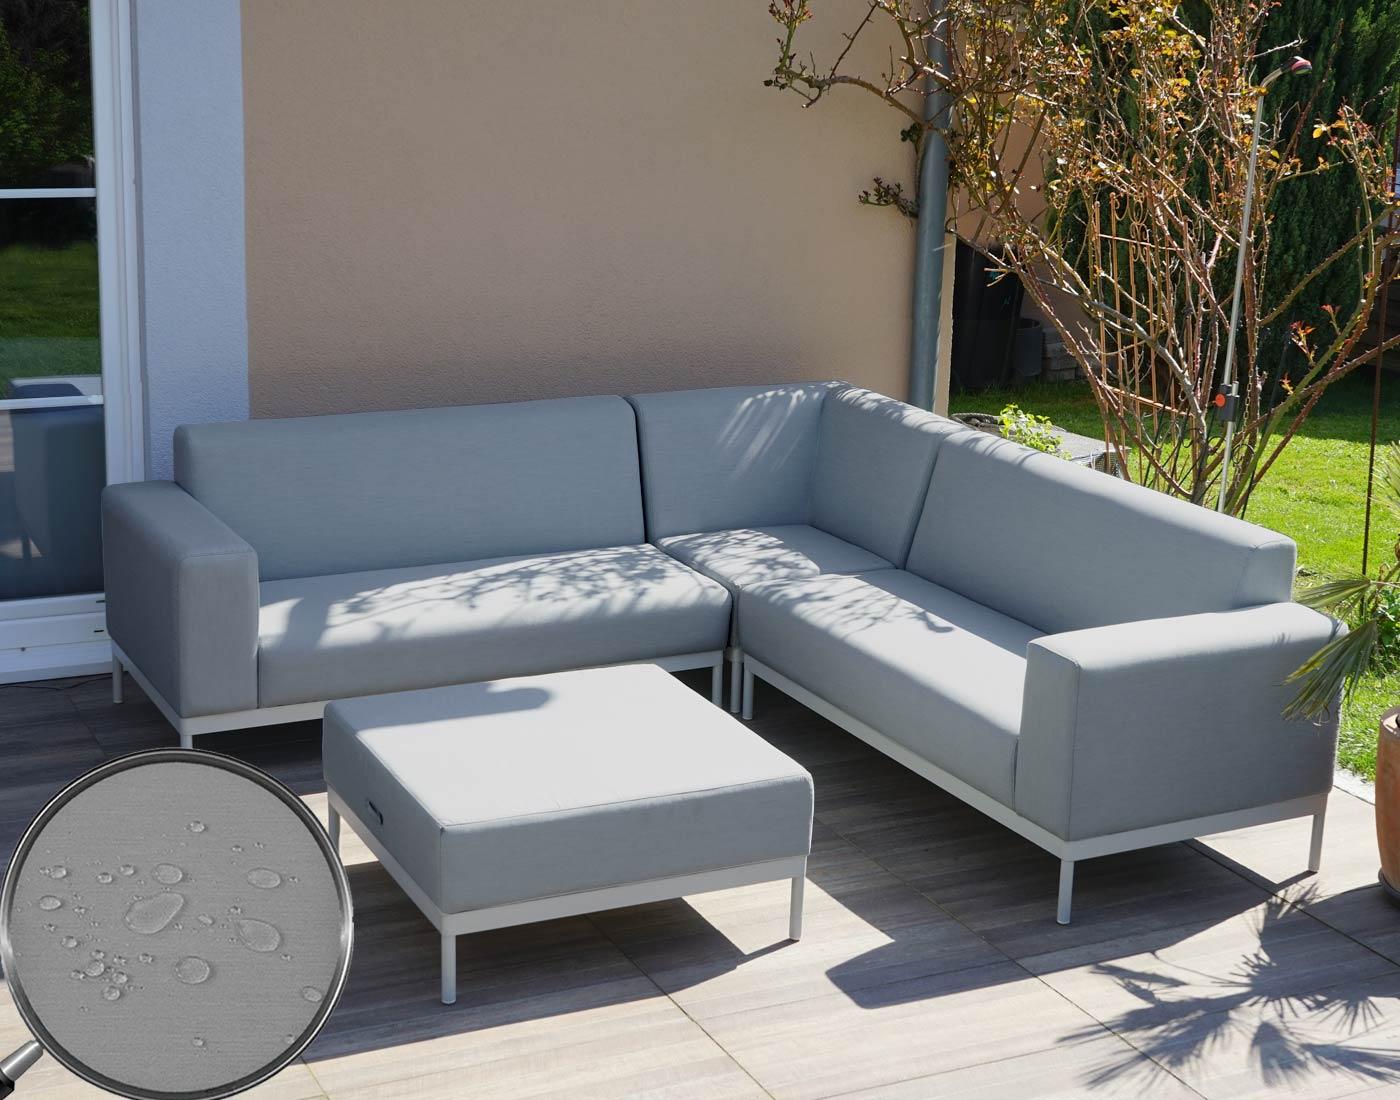 Alu garten garnitur hwc c47 sofa outdoor stoff textil for Sofa ohne kissen